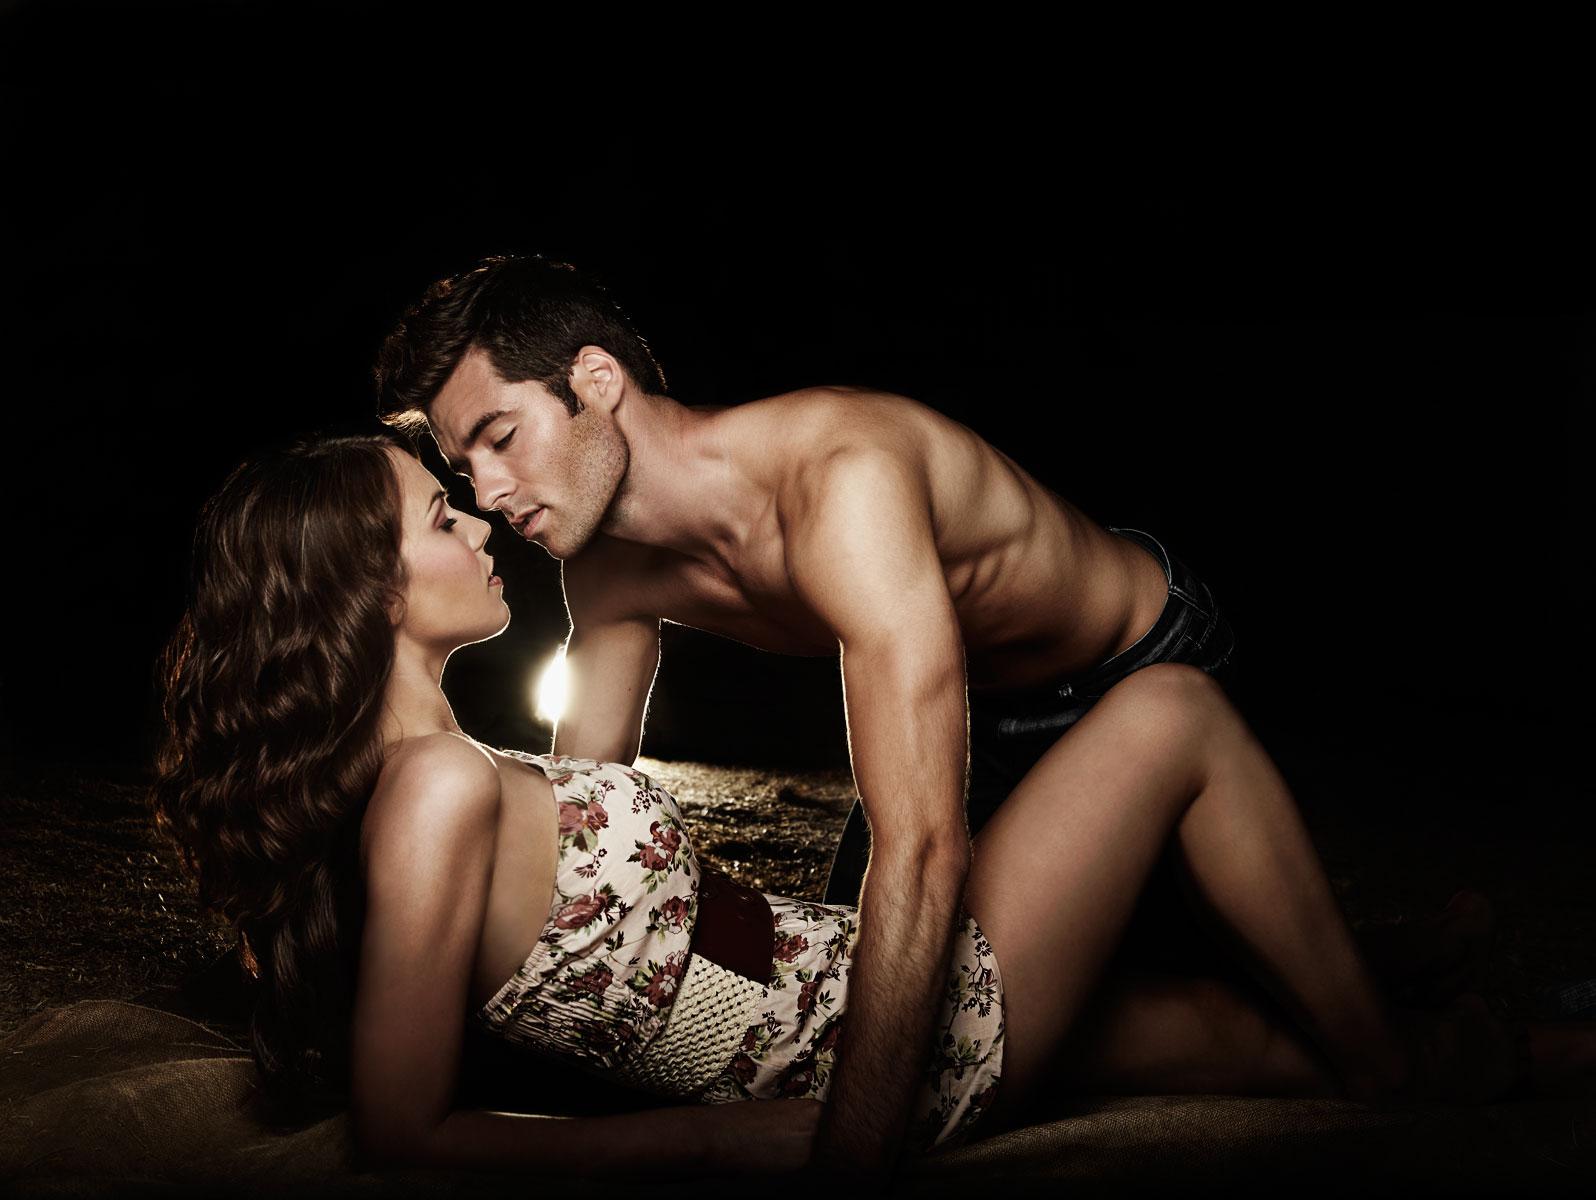 Young caucasian couple in intimate scene